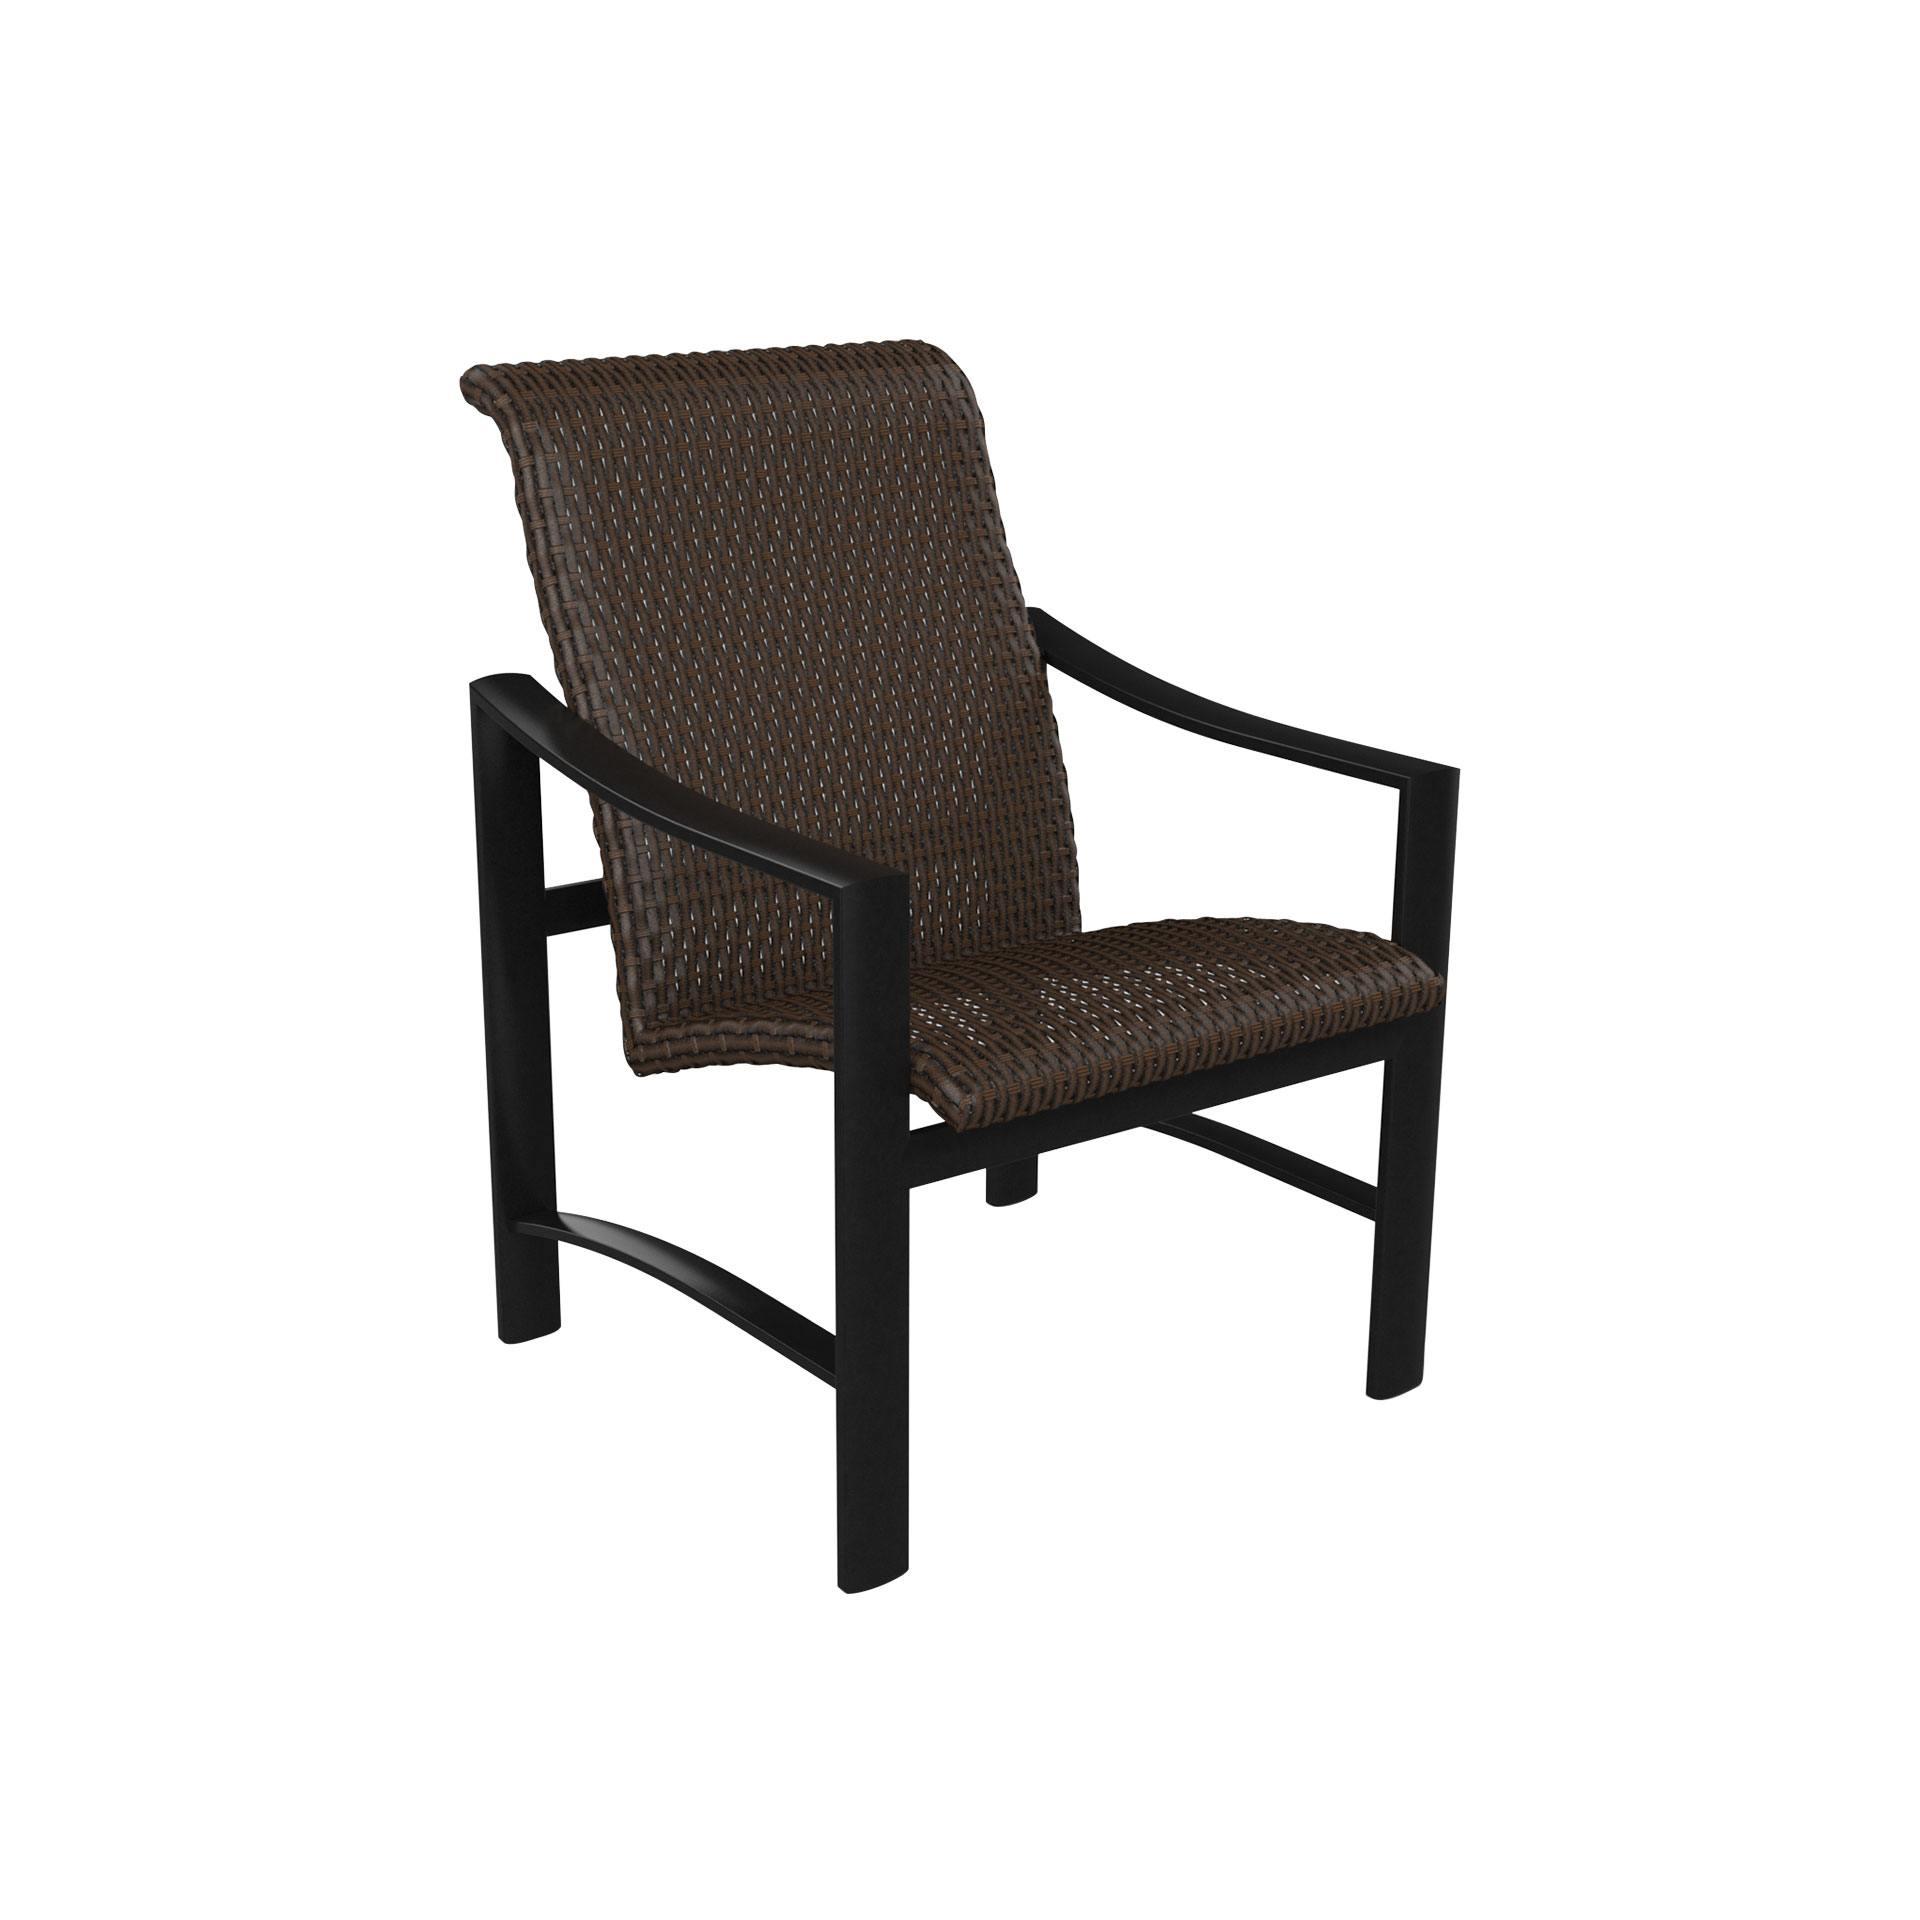 Tropitone Kenzo Woven Dining Chair Leisure Living